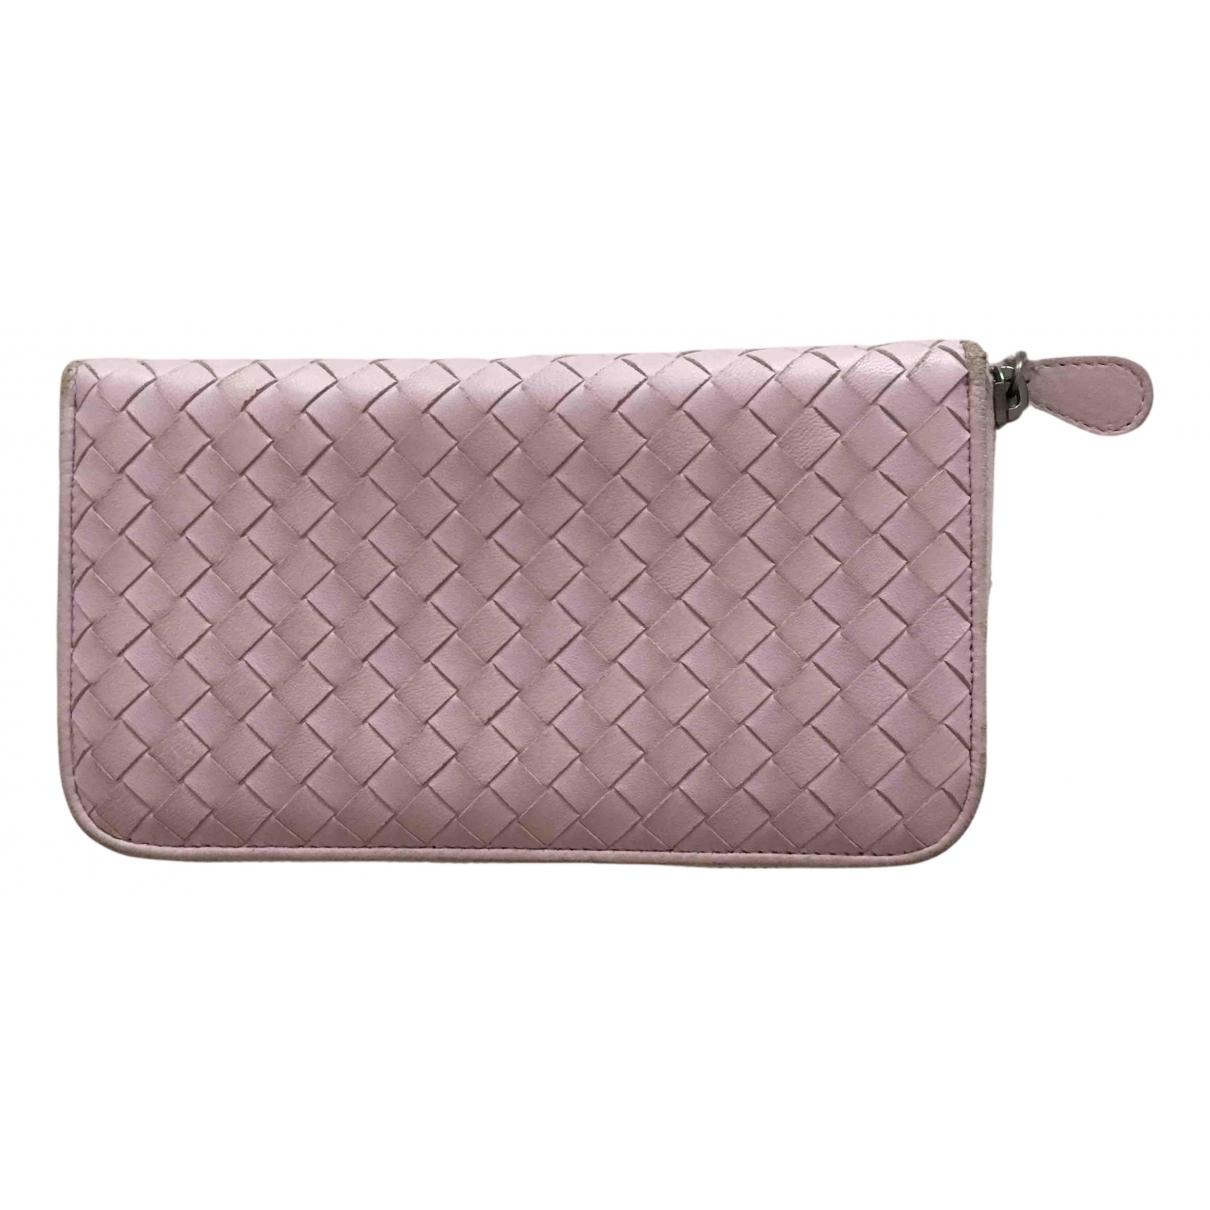 Bottega Veneta - Petite maroquinerie   pour femme en cuir - rose